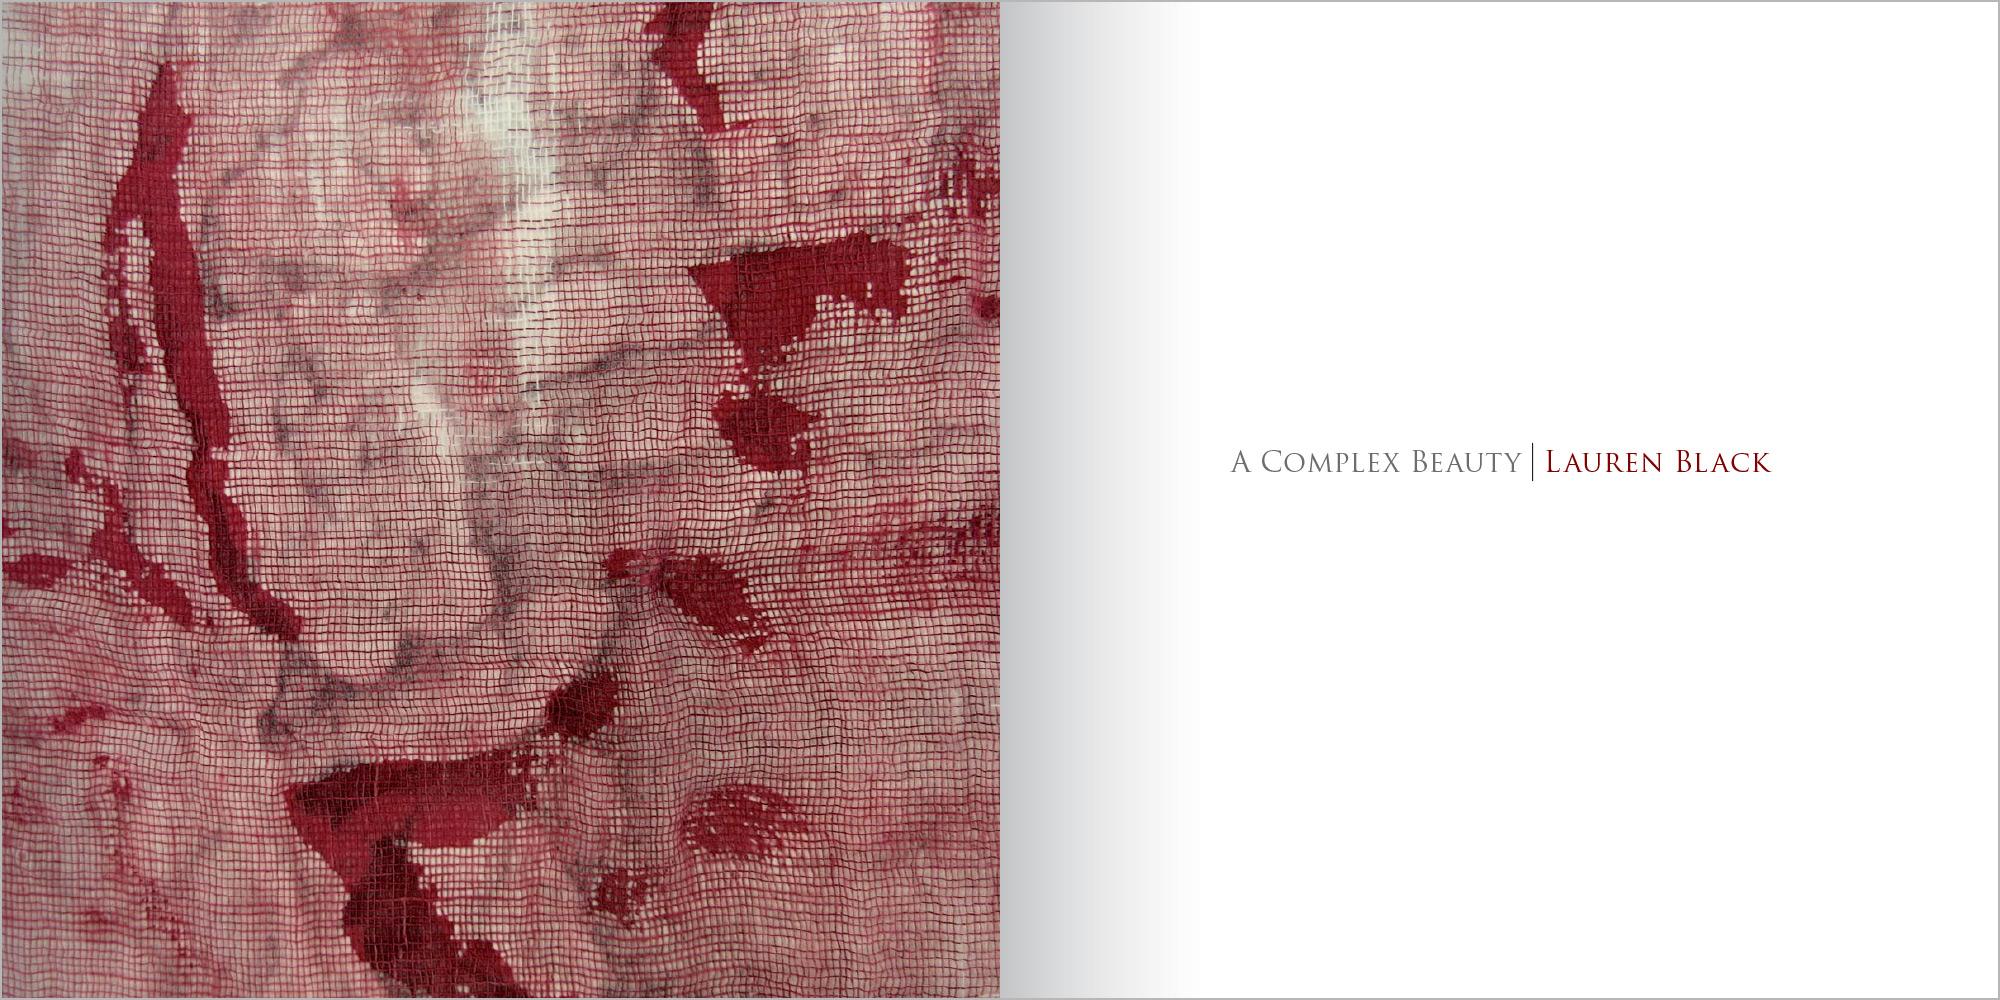 Catalogue-AComplexBeautySpread-1.jpg